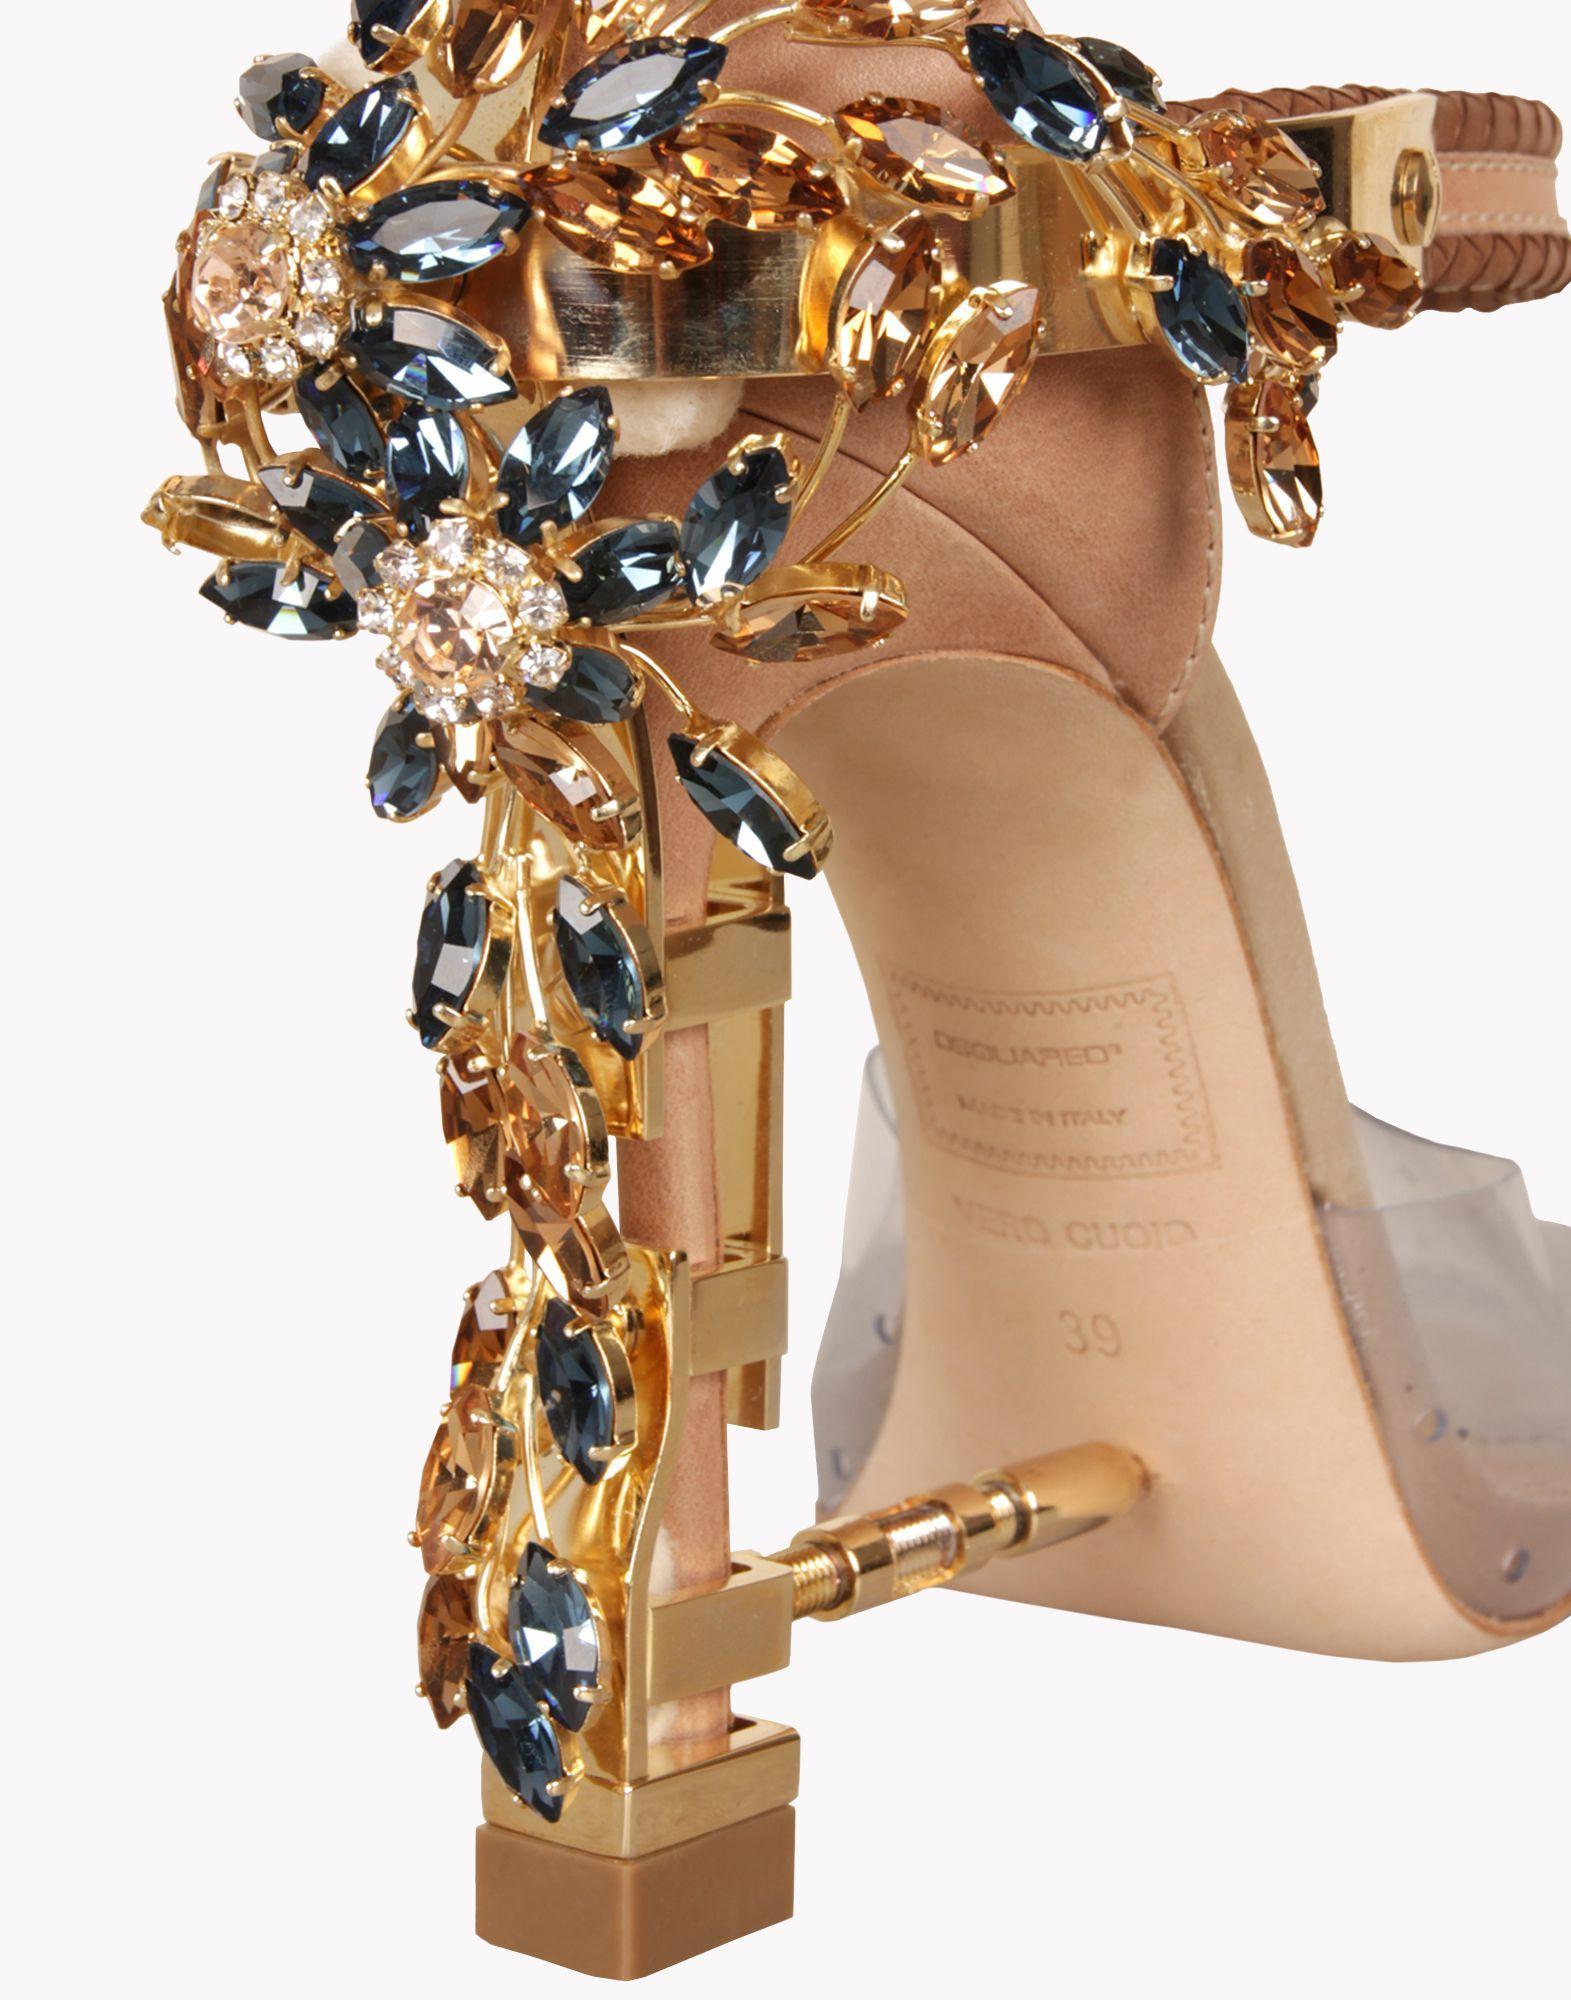 Virginia Official Heeled High Women Sandals Dsquared uJ1Kl3TFc